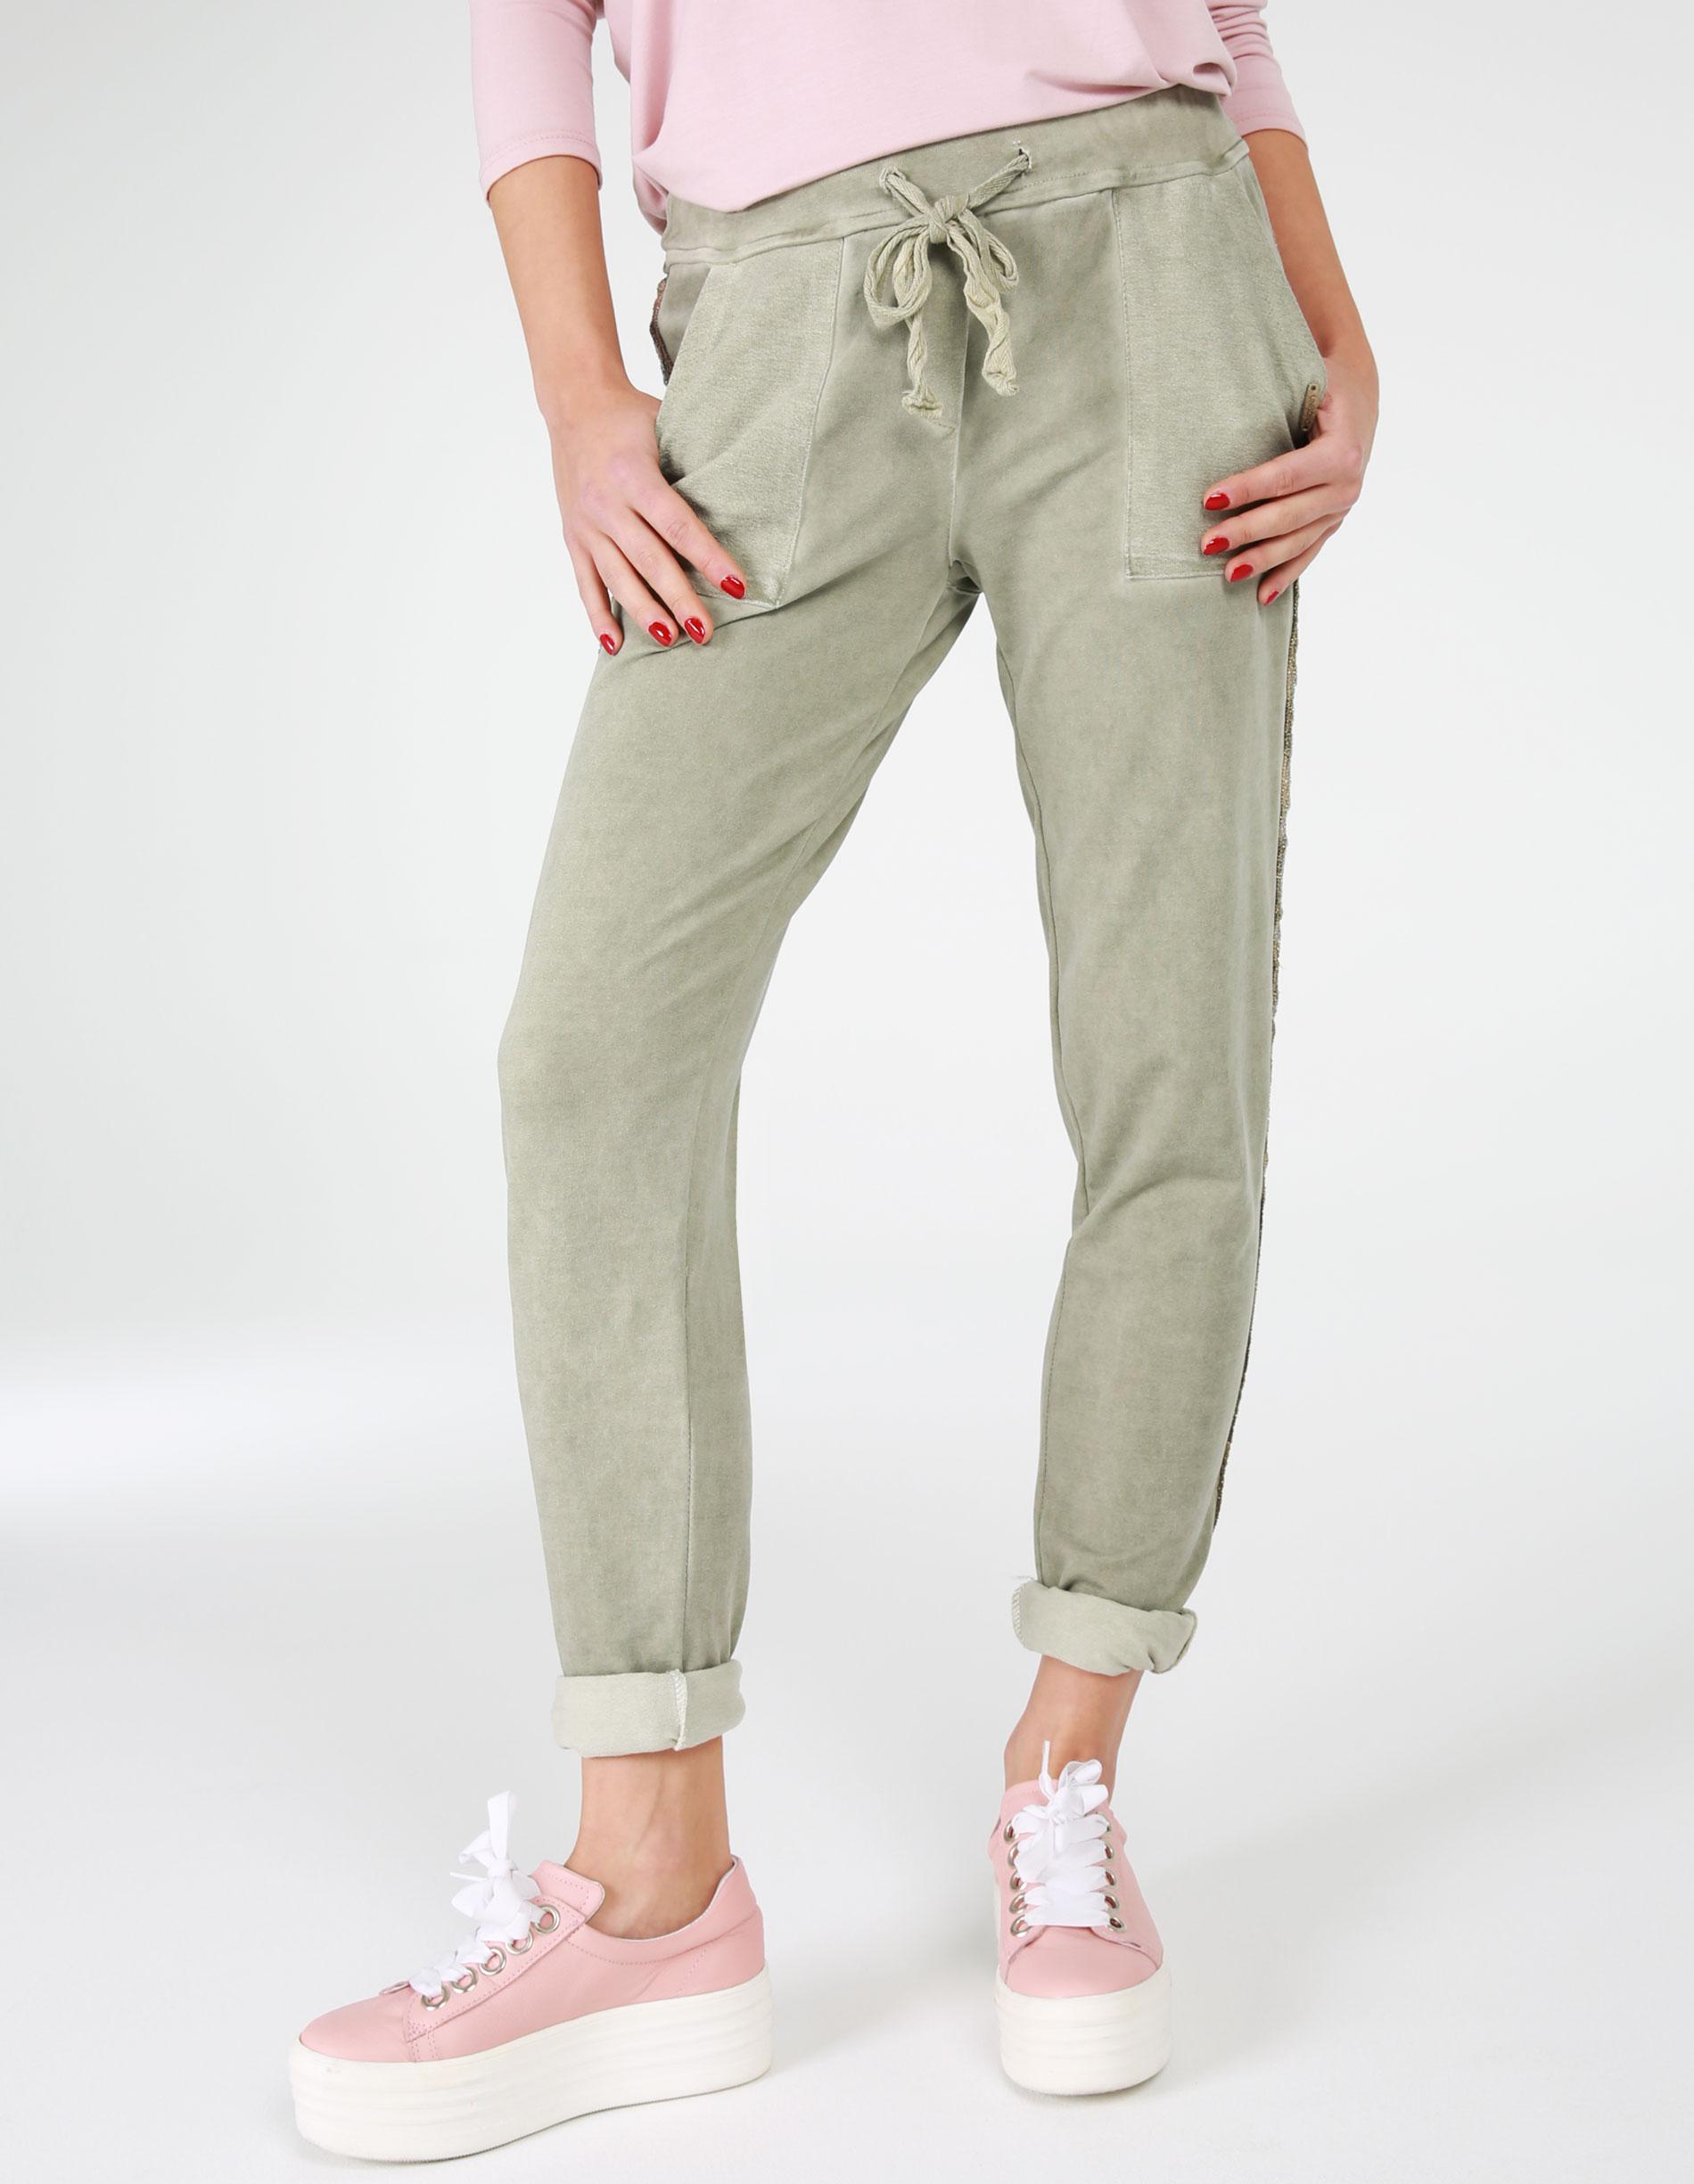 Spodnie - 158-2356 MILI - Unisono